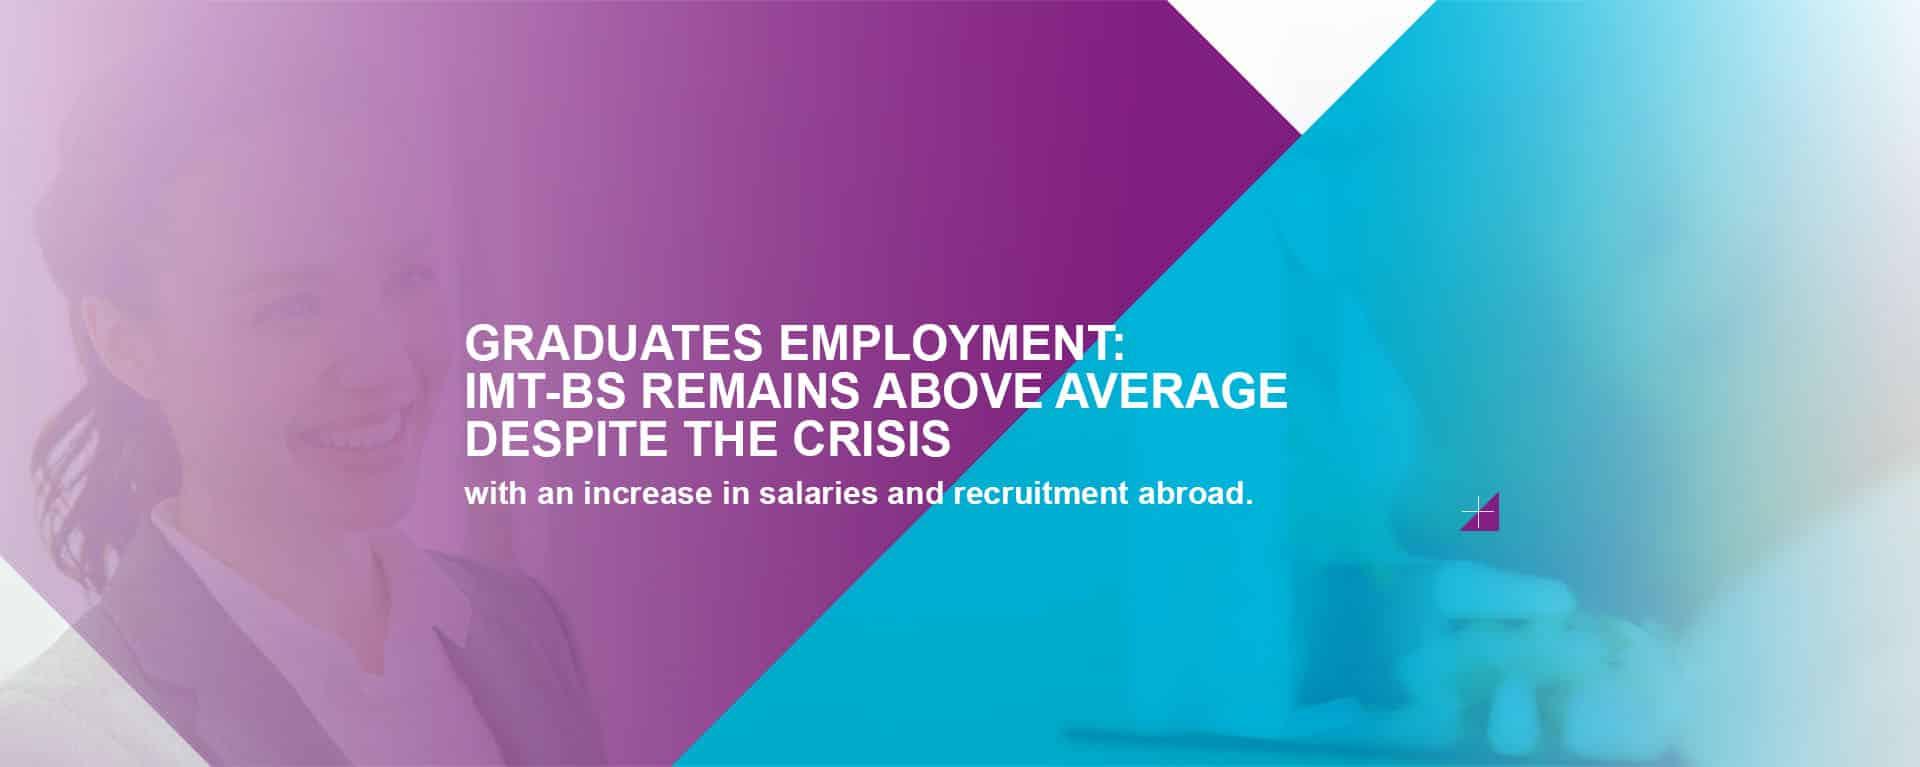 Graduates' Employment